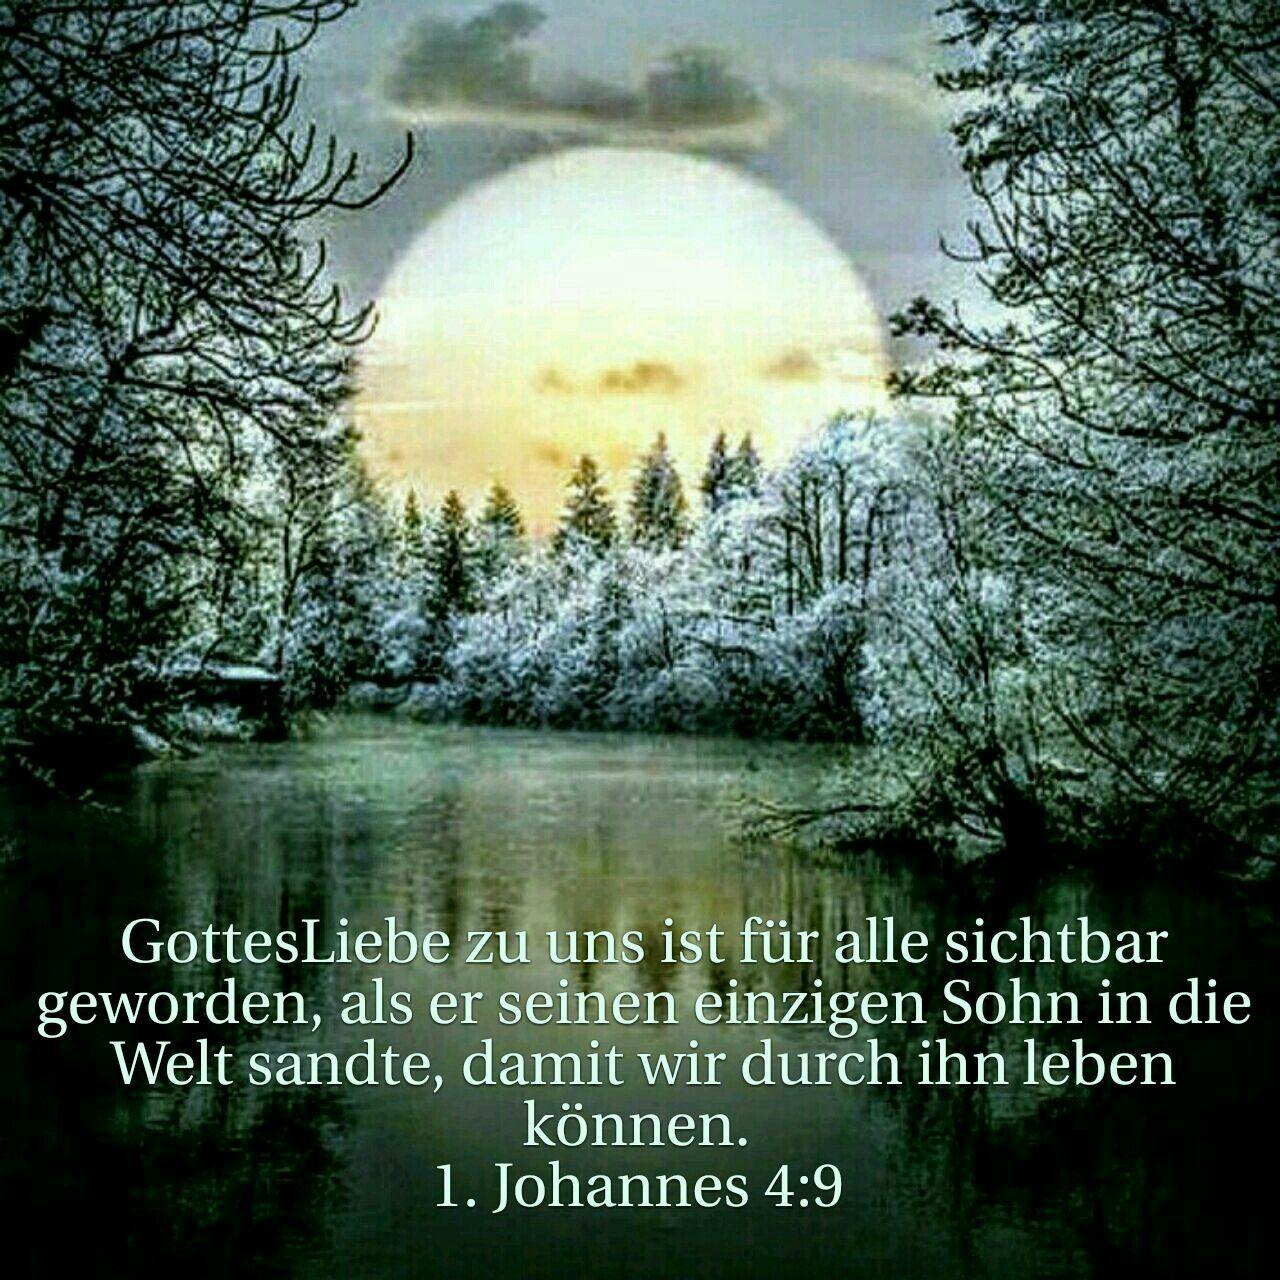 Johannes 4